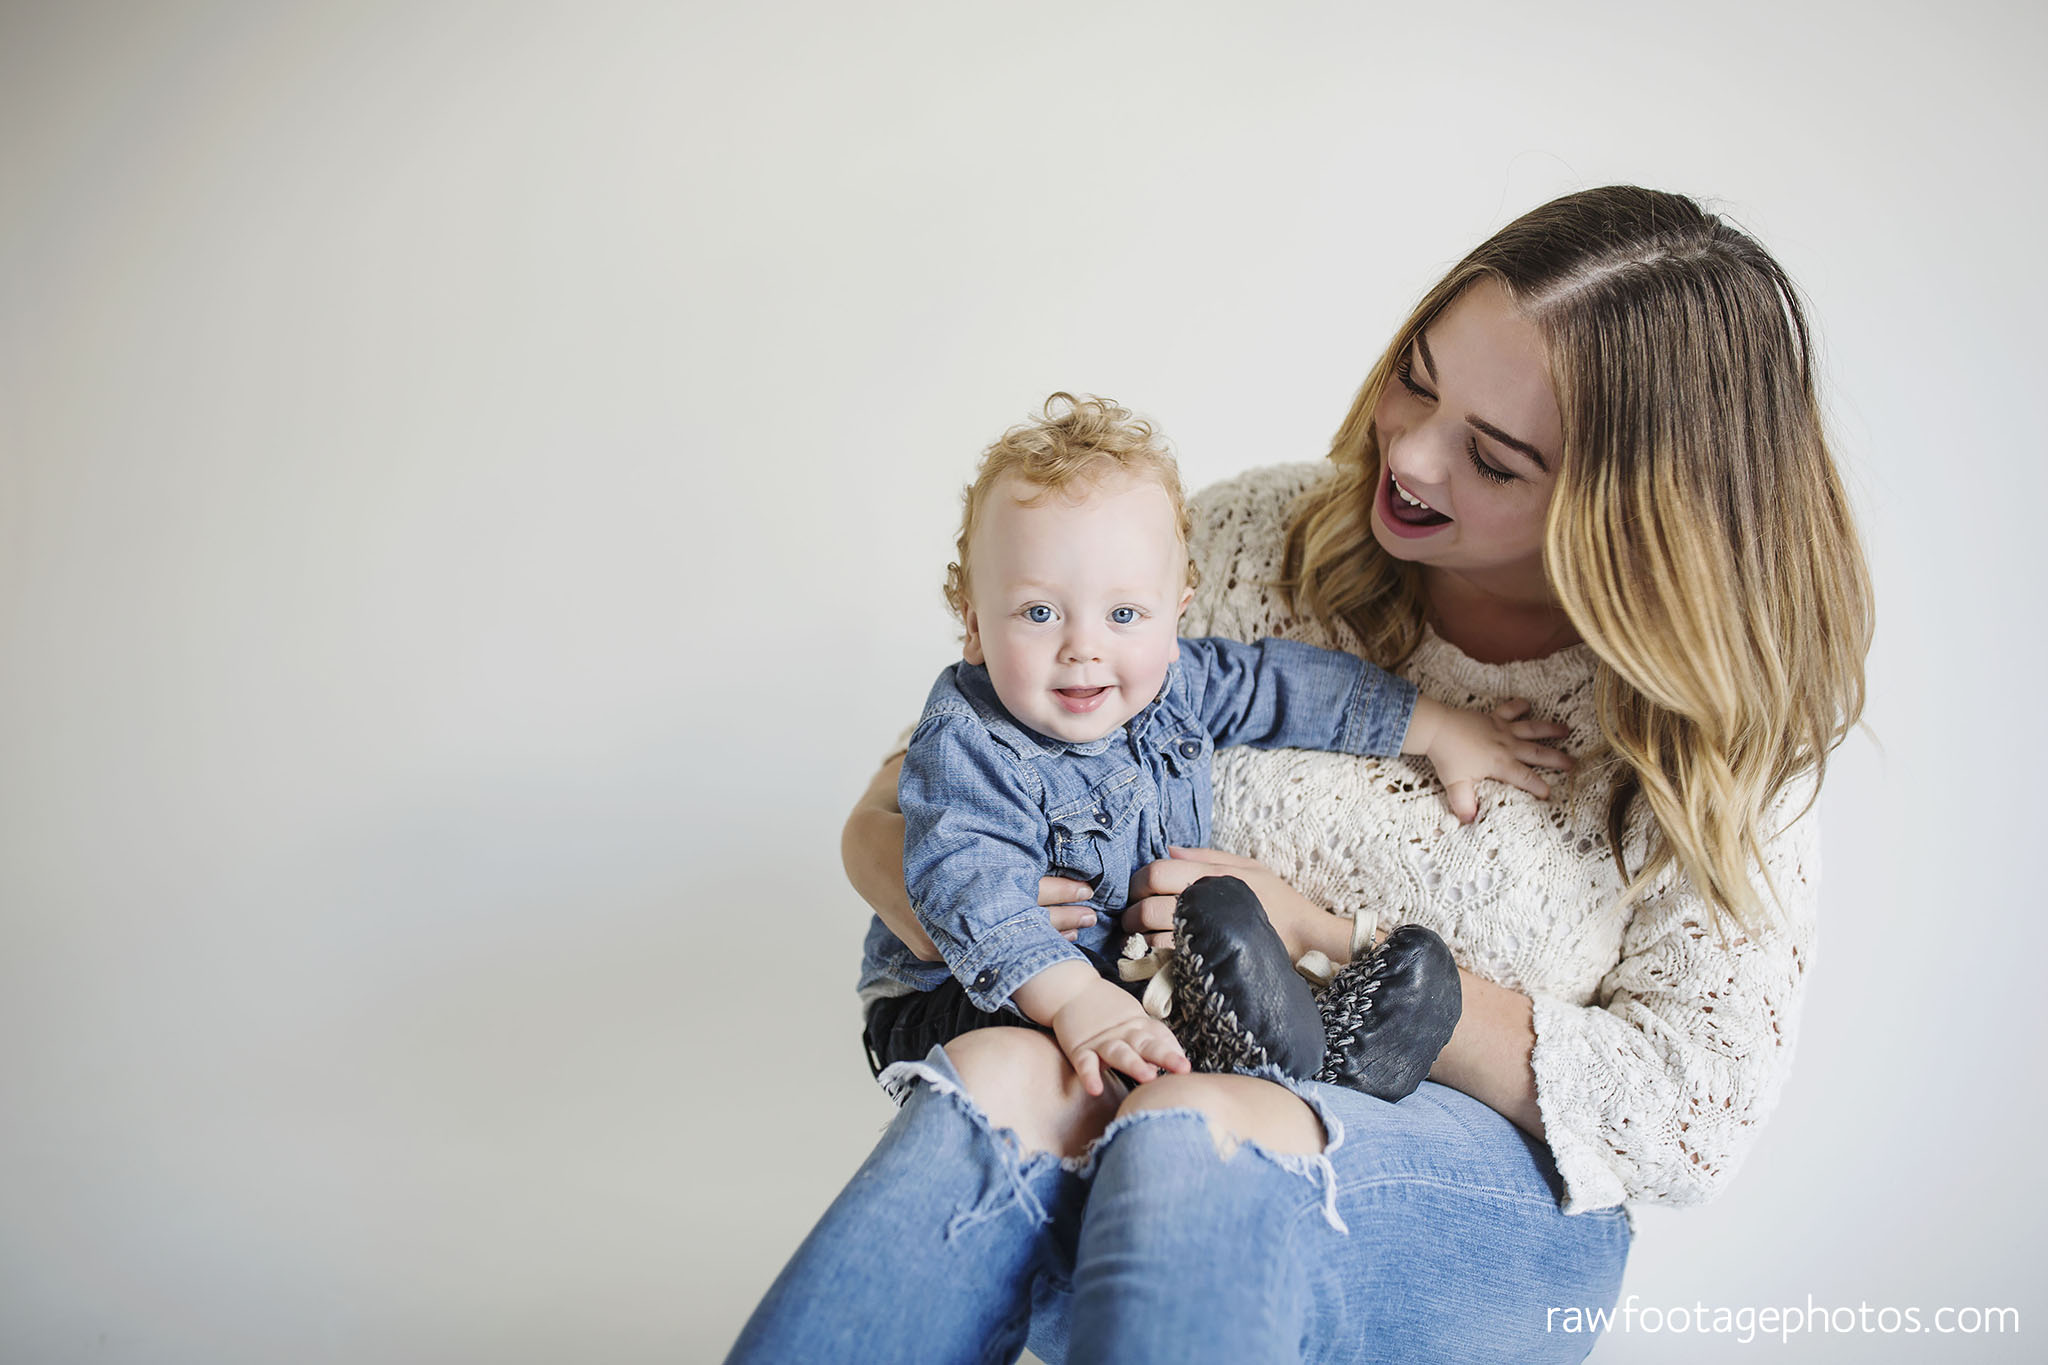 london_ontario_family_photographer-studio_photography-studio_lifestyle_portraits-white_studio-mother_son-candid_family_photography-raw_footage_photography006.jpg